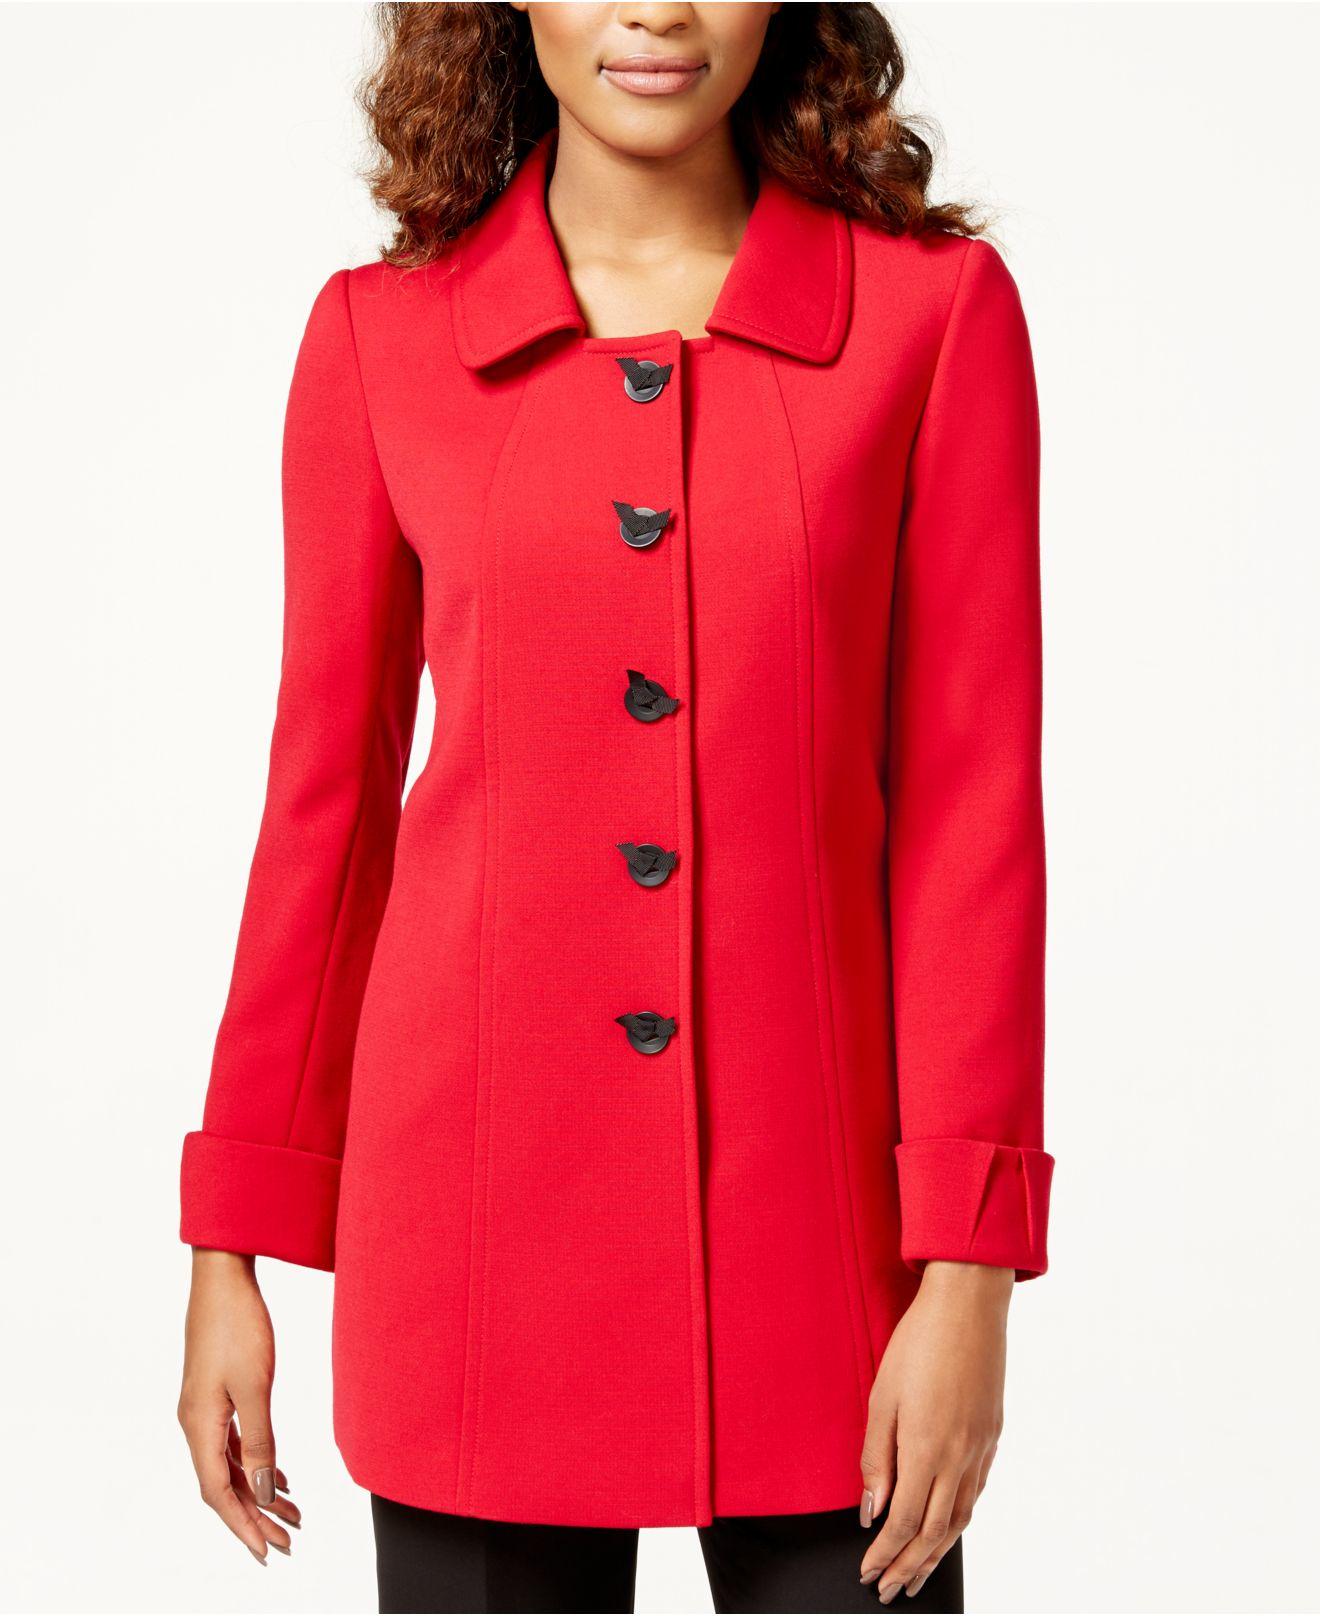 Tahari 5-button Ponte Car Coat in Red | Lyst